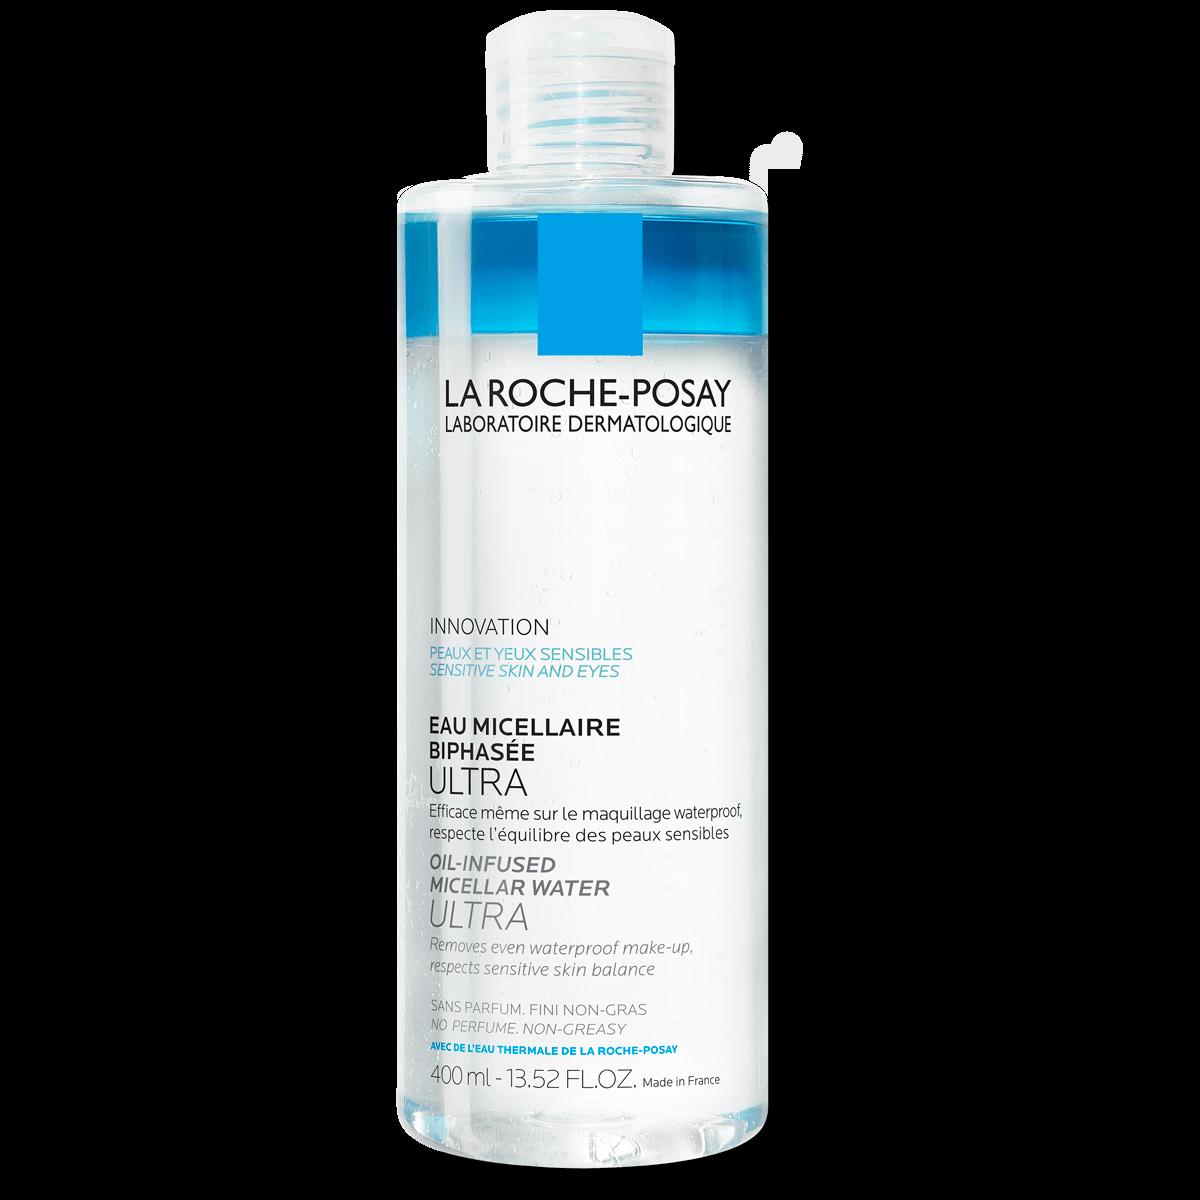 LaRochePosay-Produkt-Oblicej-Fyziologicky-Olej-Obohaceny-Micelarni-Vodou-Ultra-400ml-3337875725897-FSS